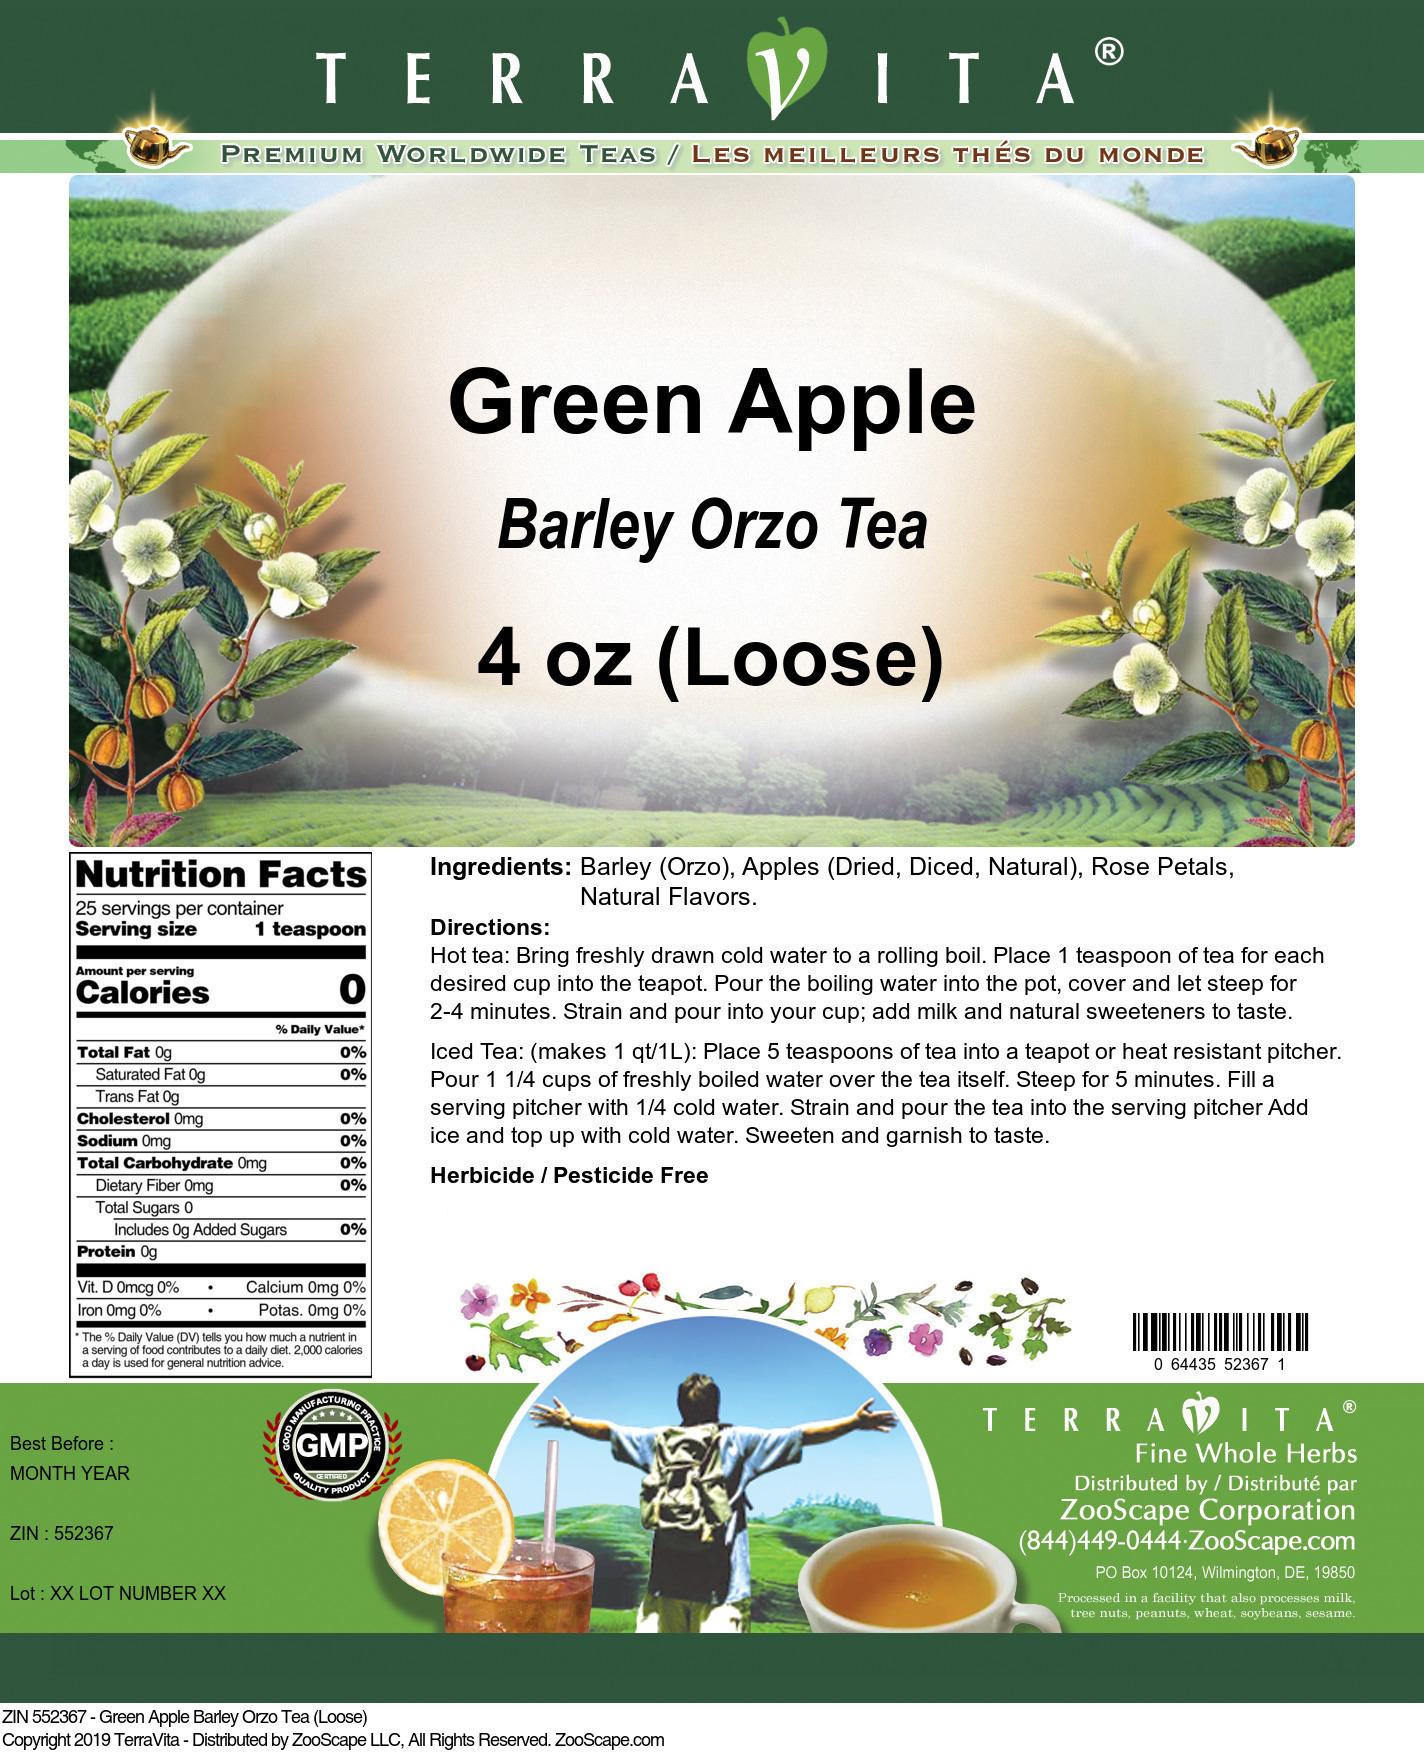 Green Apple Barley Orzo